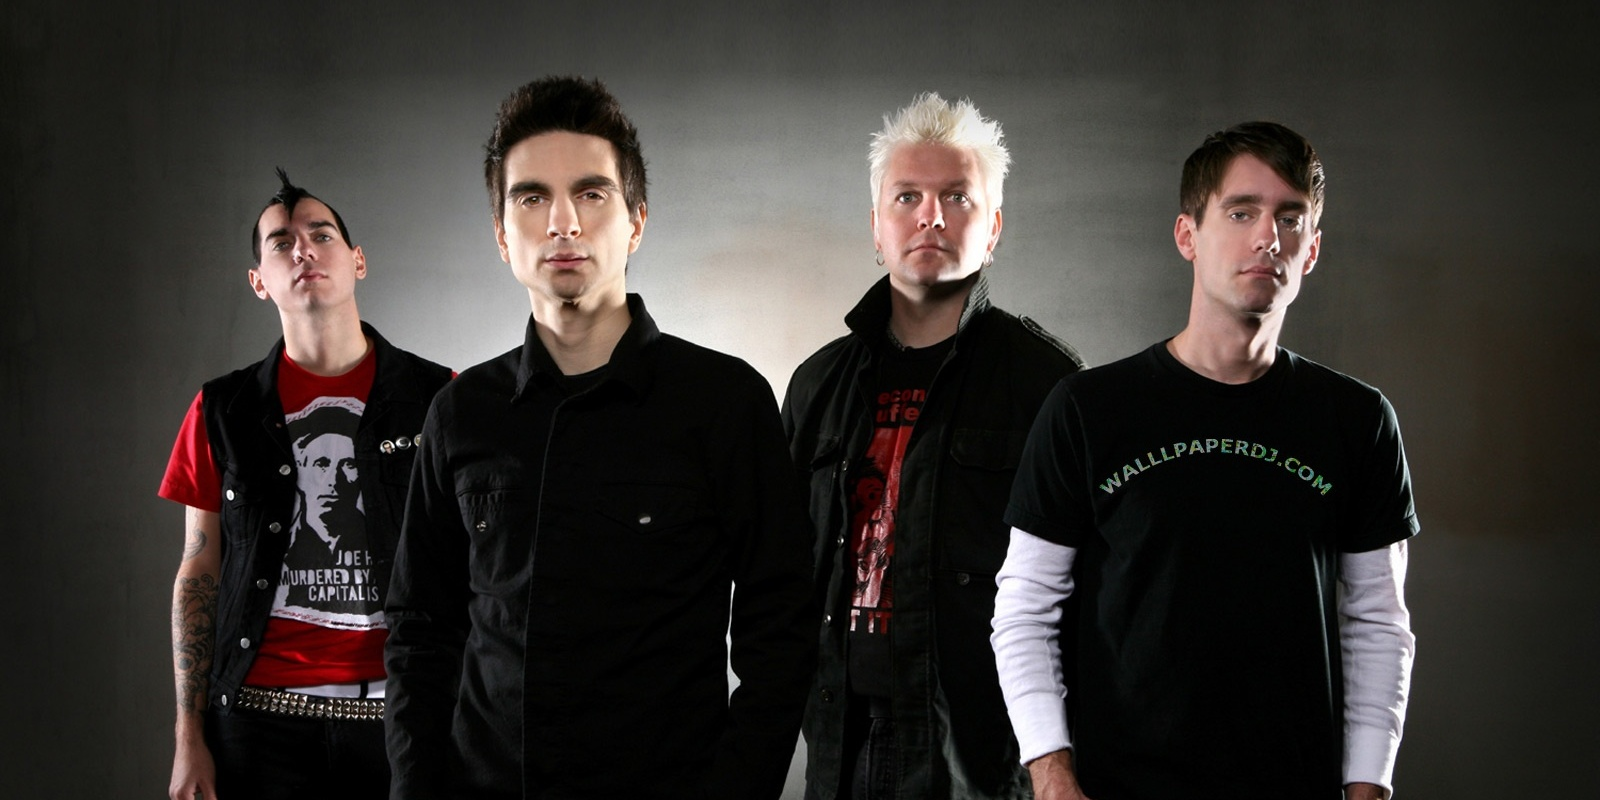 Punk rock outfit Anti-Flag to make Singapore debut